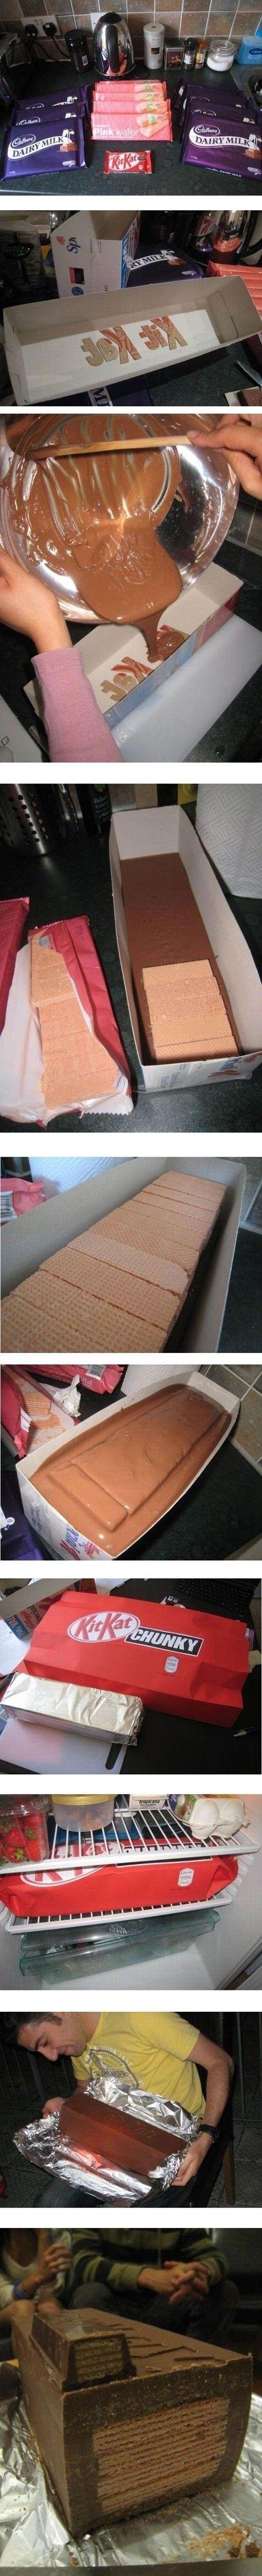 Huge Kit Kat